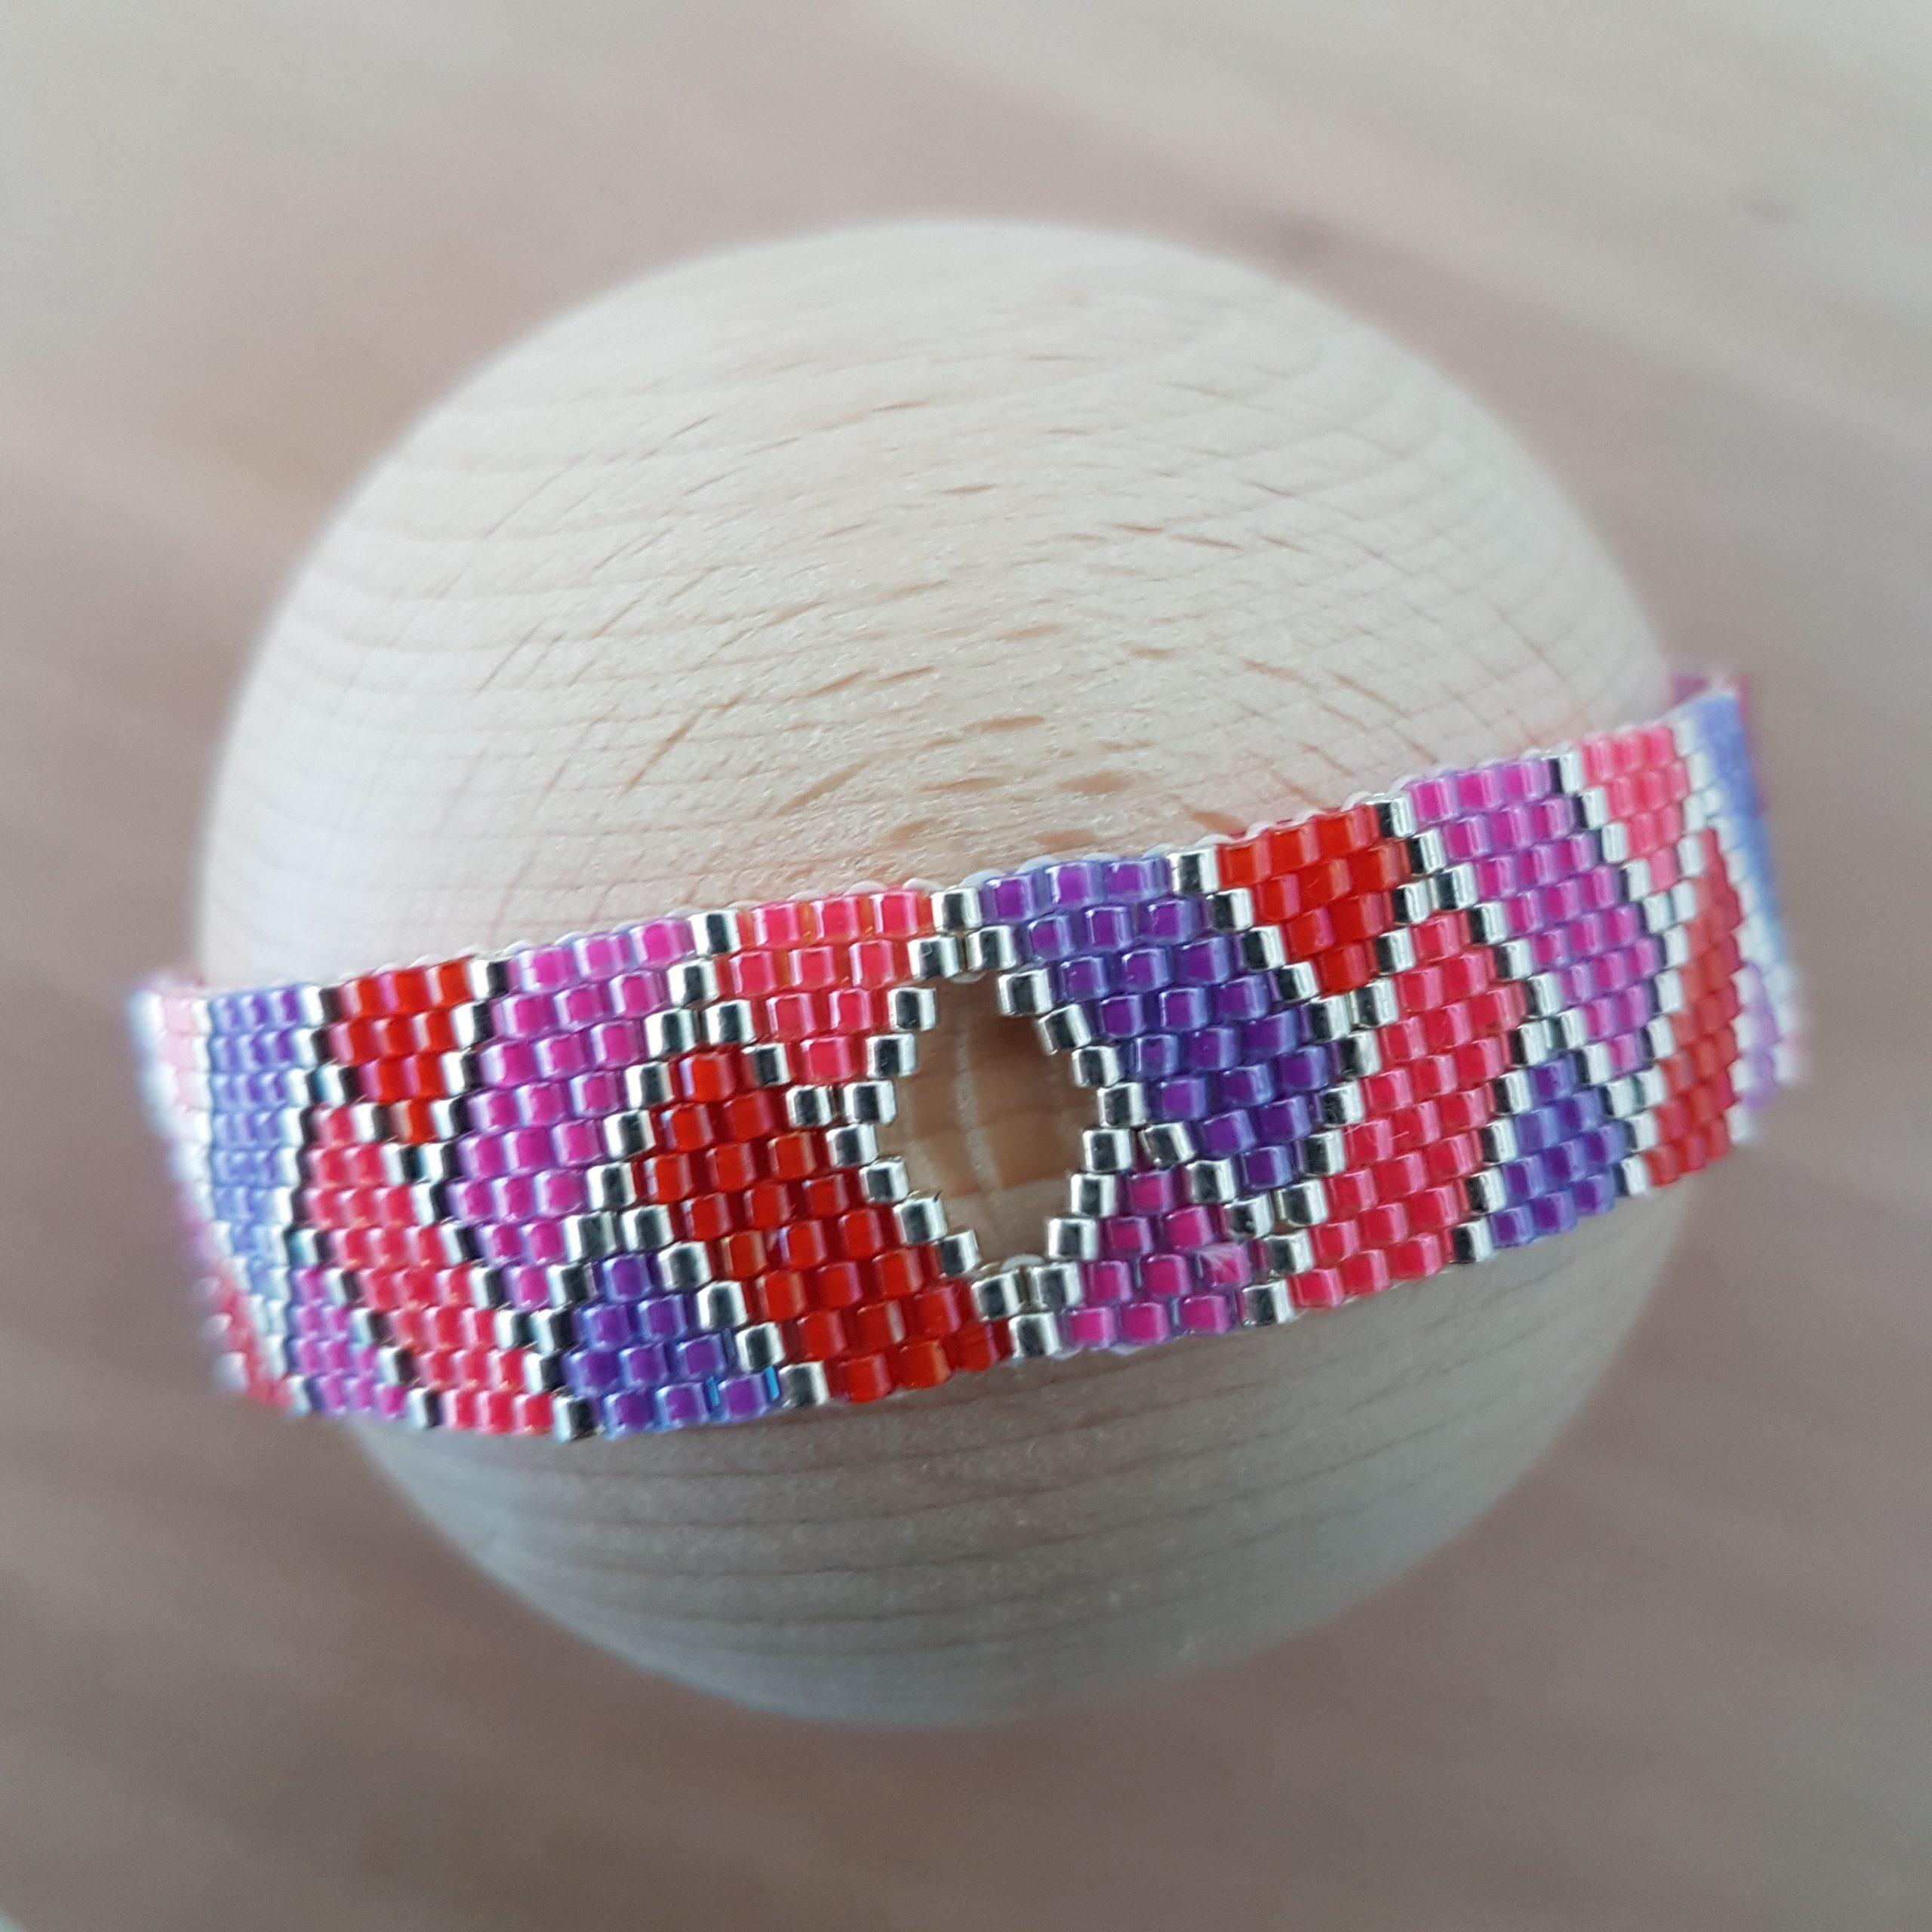 Cadeau femme Bijou artisanal lyon Bracelet Arlequin rose rouge violet argent 925 miyuki